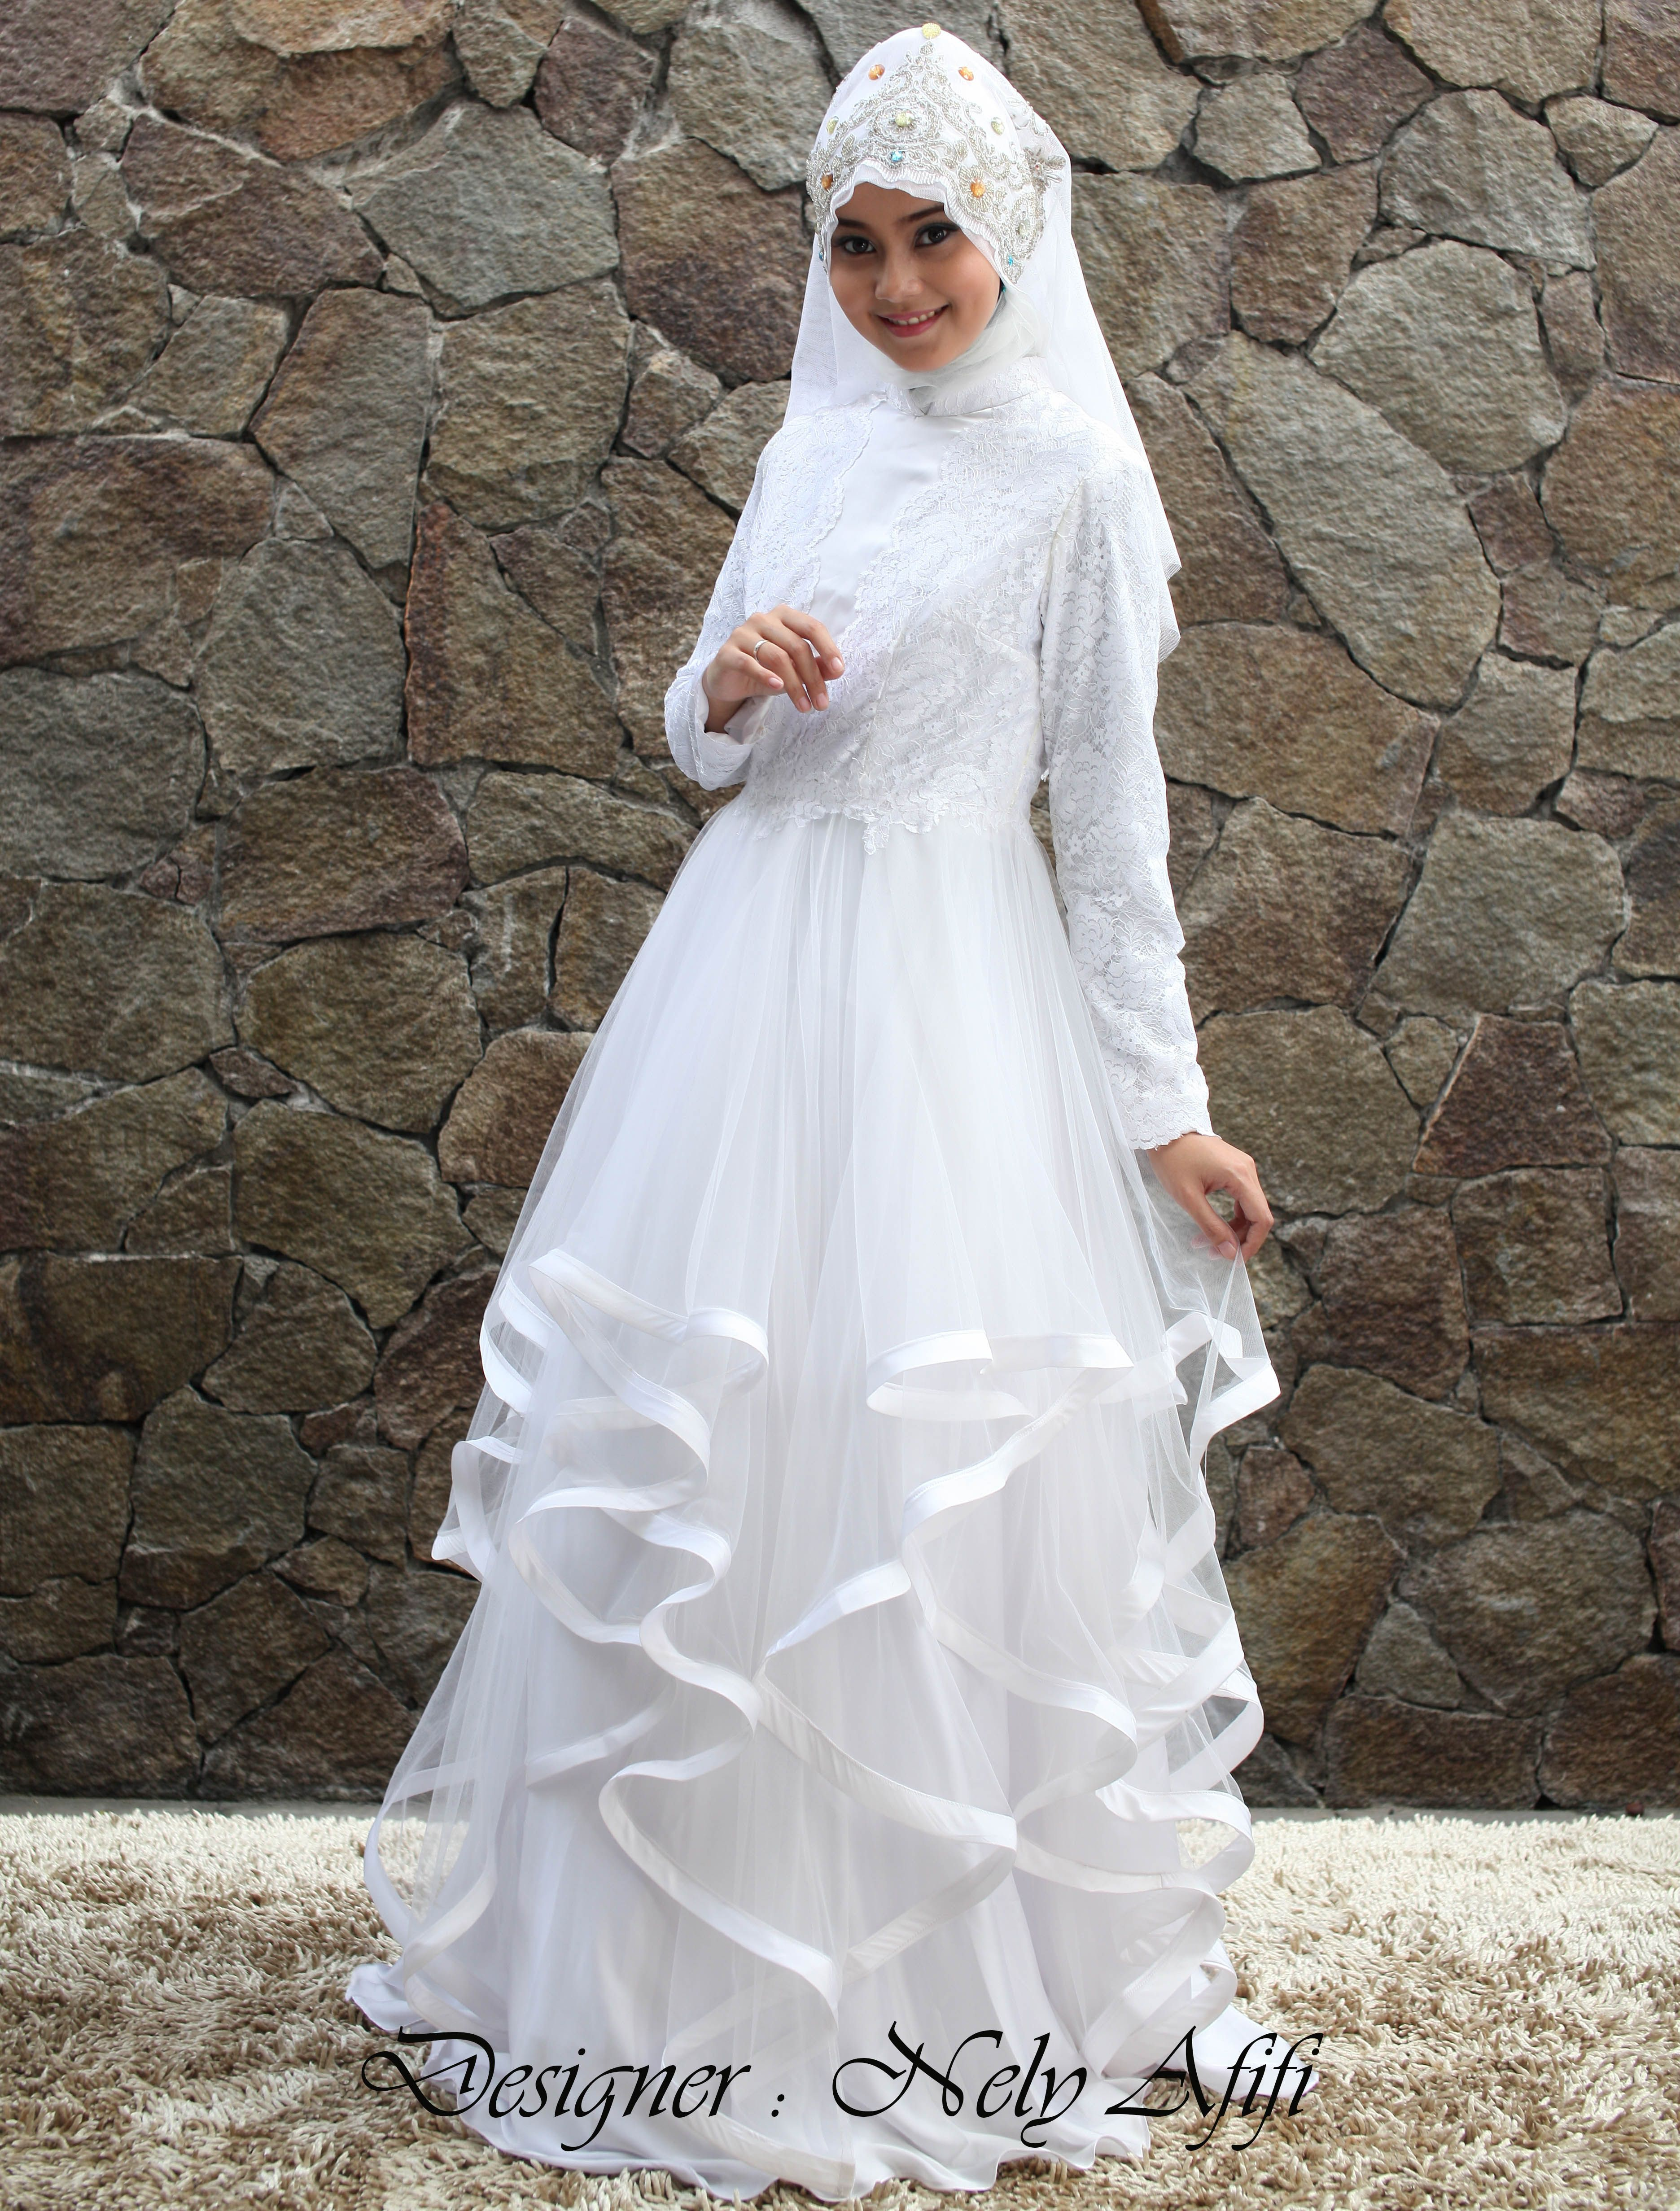 Kumpulan Gambar Sketsa Gaun Pengantin Muslimah